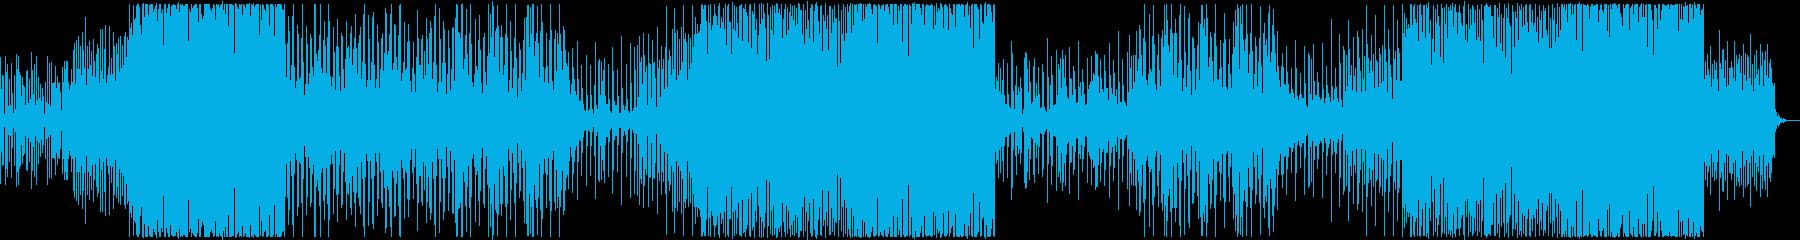 kawaii 可愛いサウンドのEDMの再生済みの波形